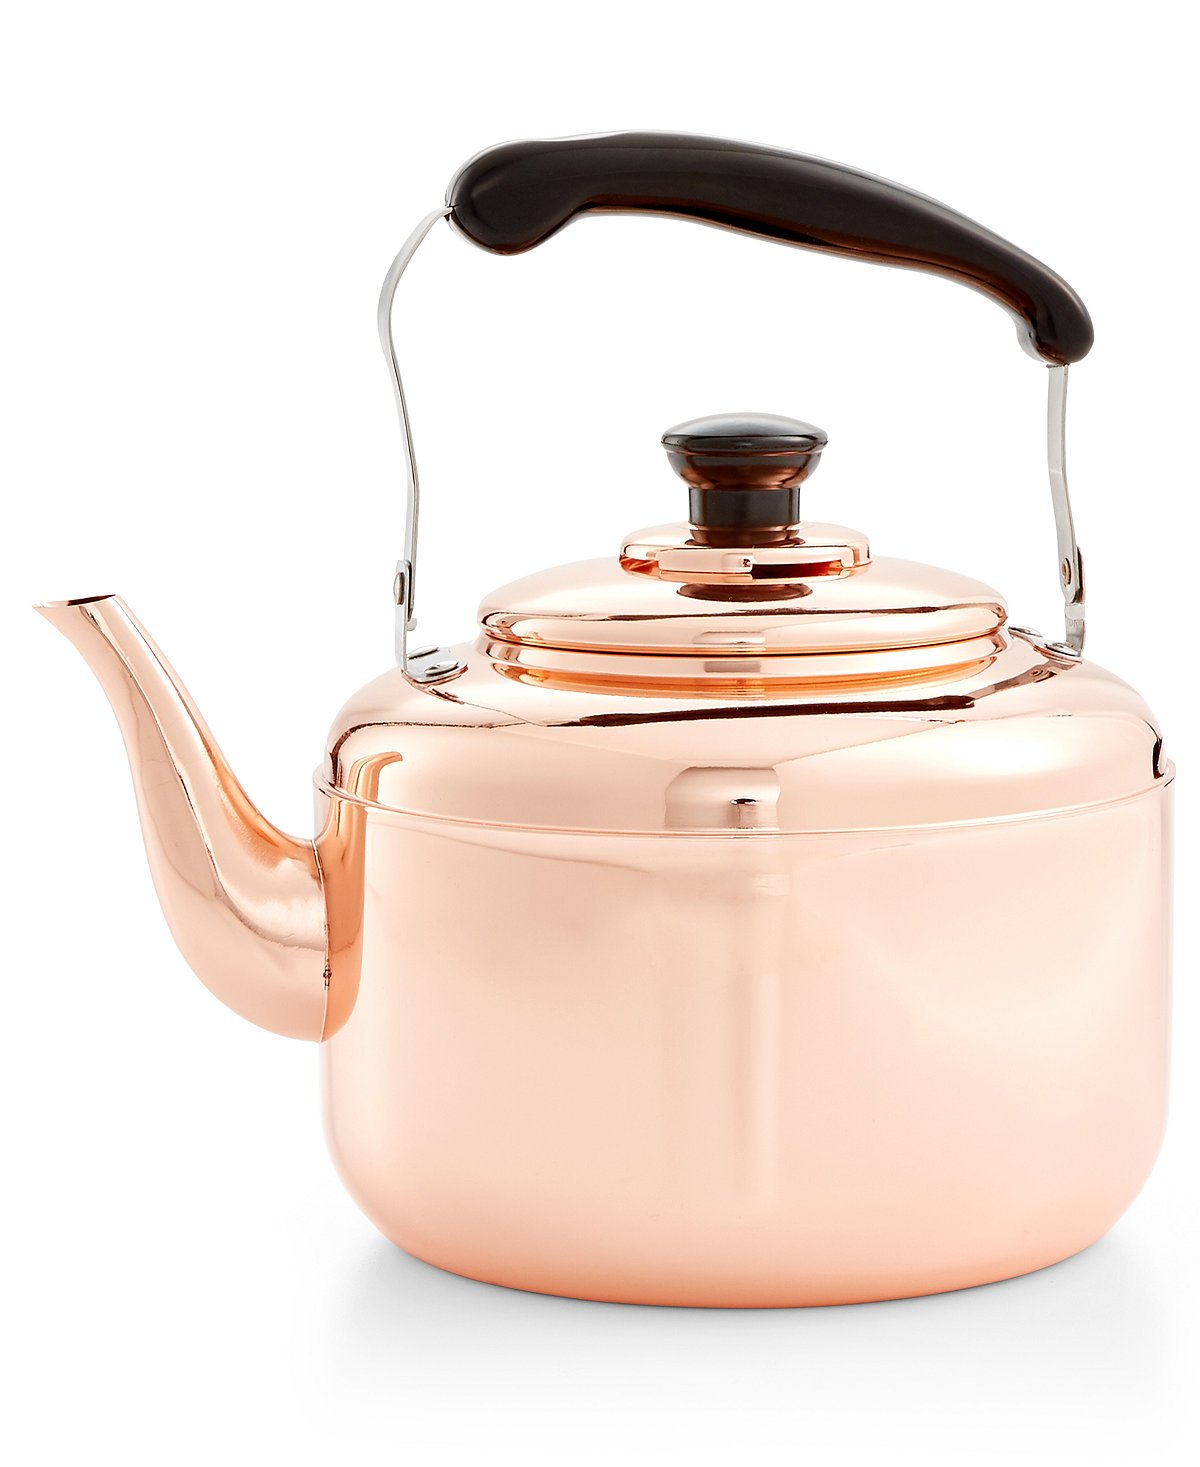 Martha Stewart Vintage Heirloom Copper Tea Kettle